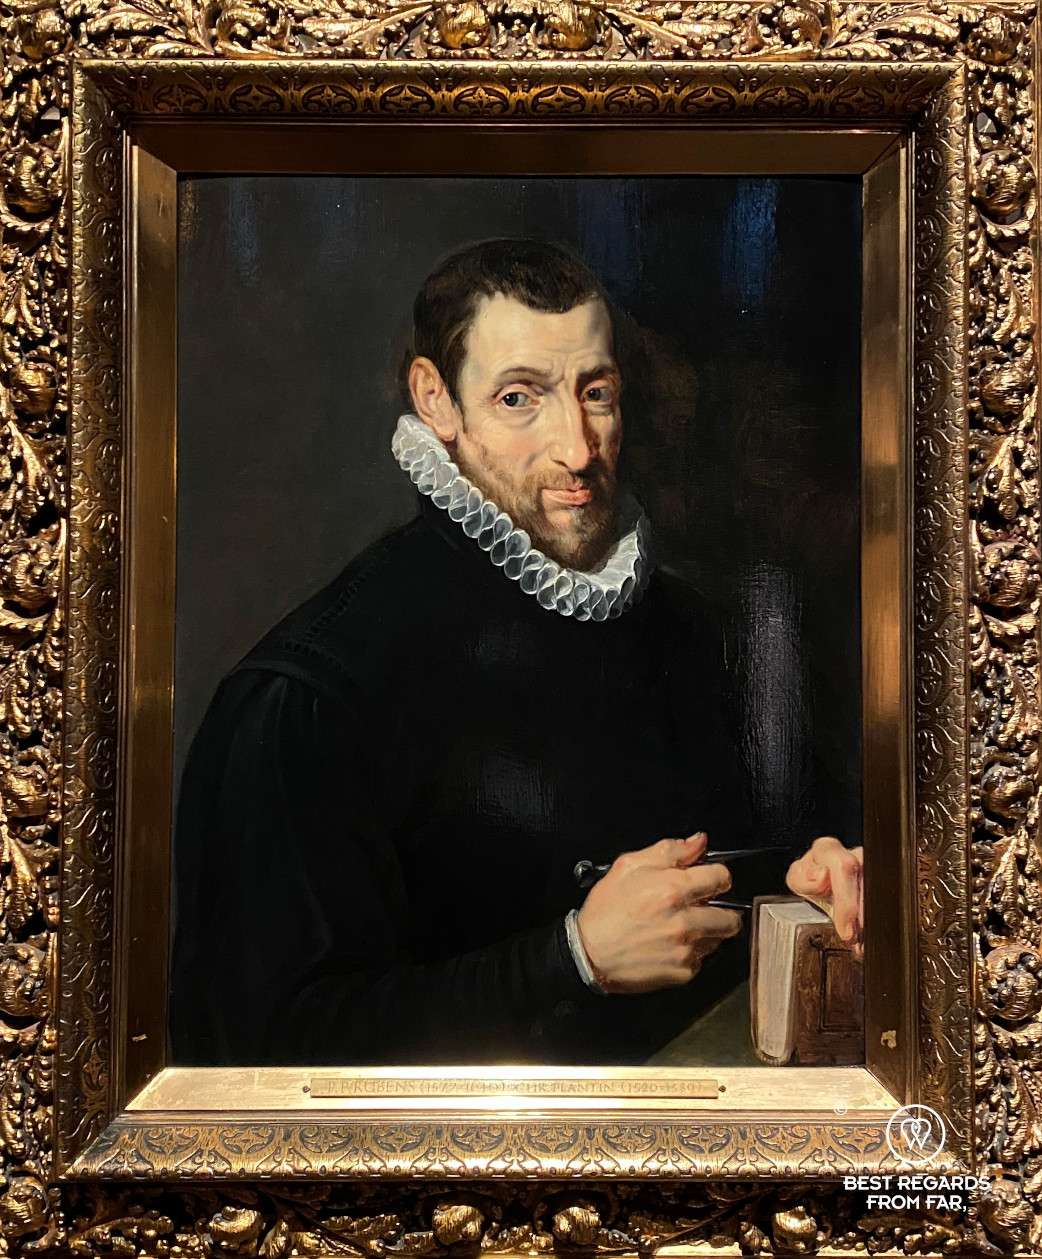 Christophe Plantin by Rubens, Plantin Moretus Museum, Antwerp